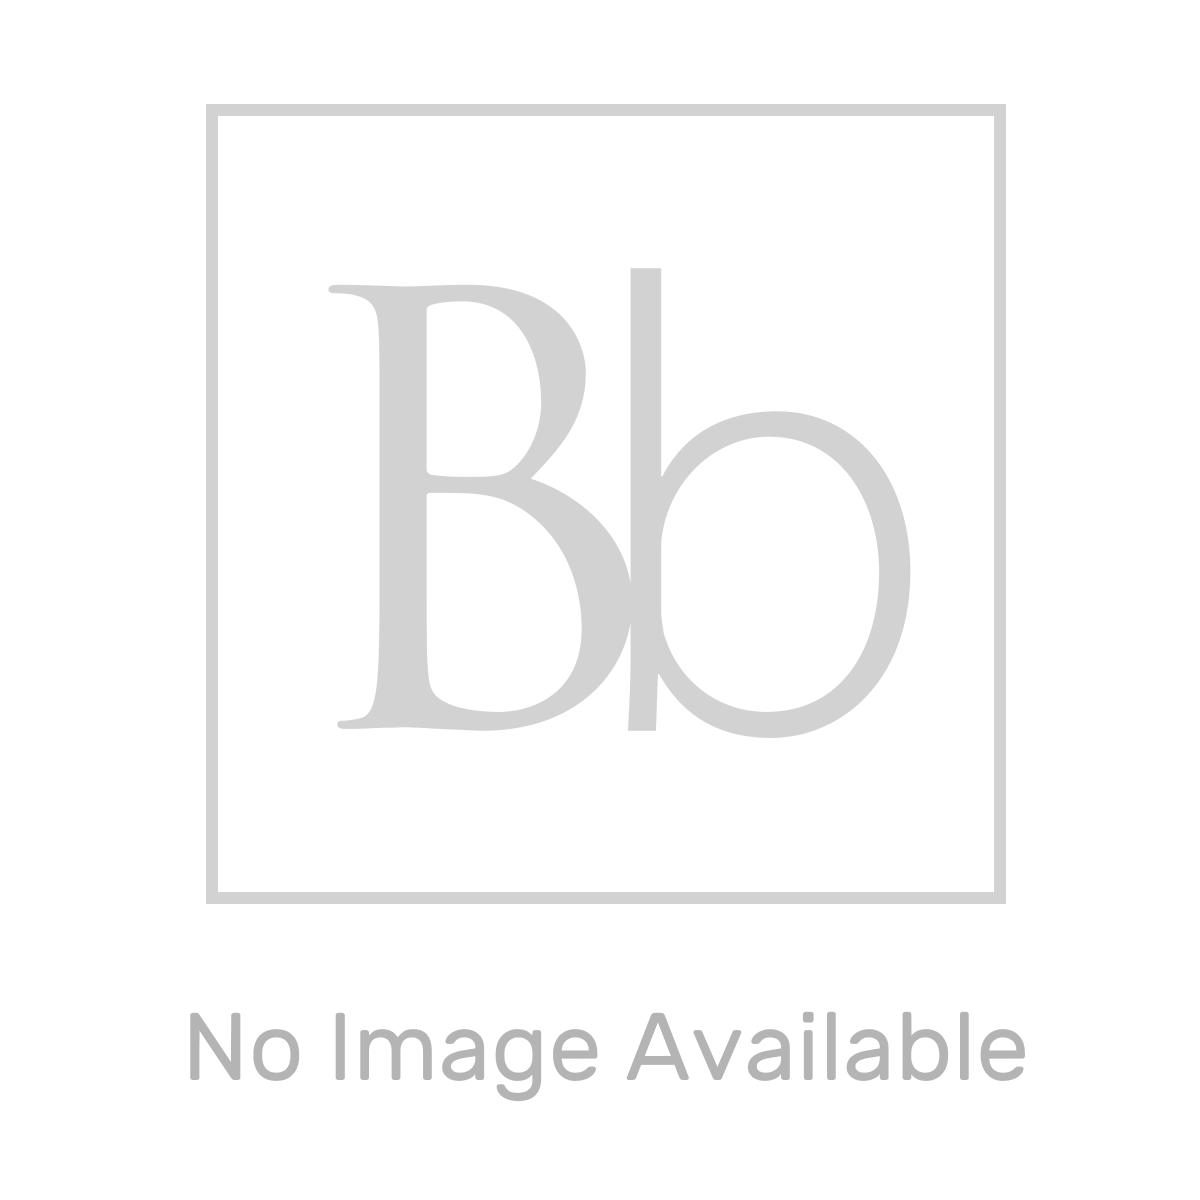 Nuie Athena Stone Grey 2 Drawer Floor Standing Vanity Unit with 18mm Worktop 800mm